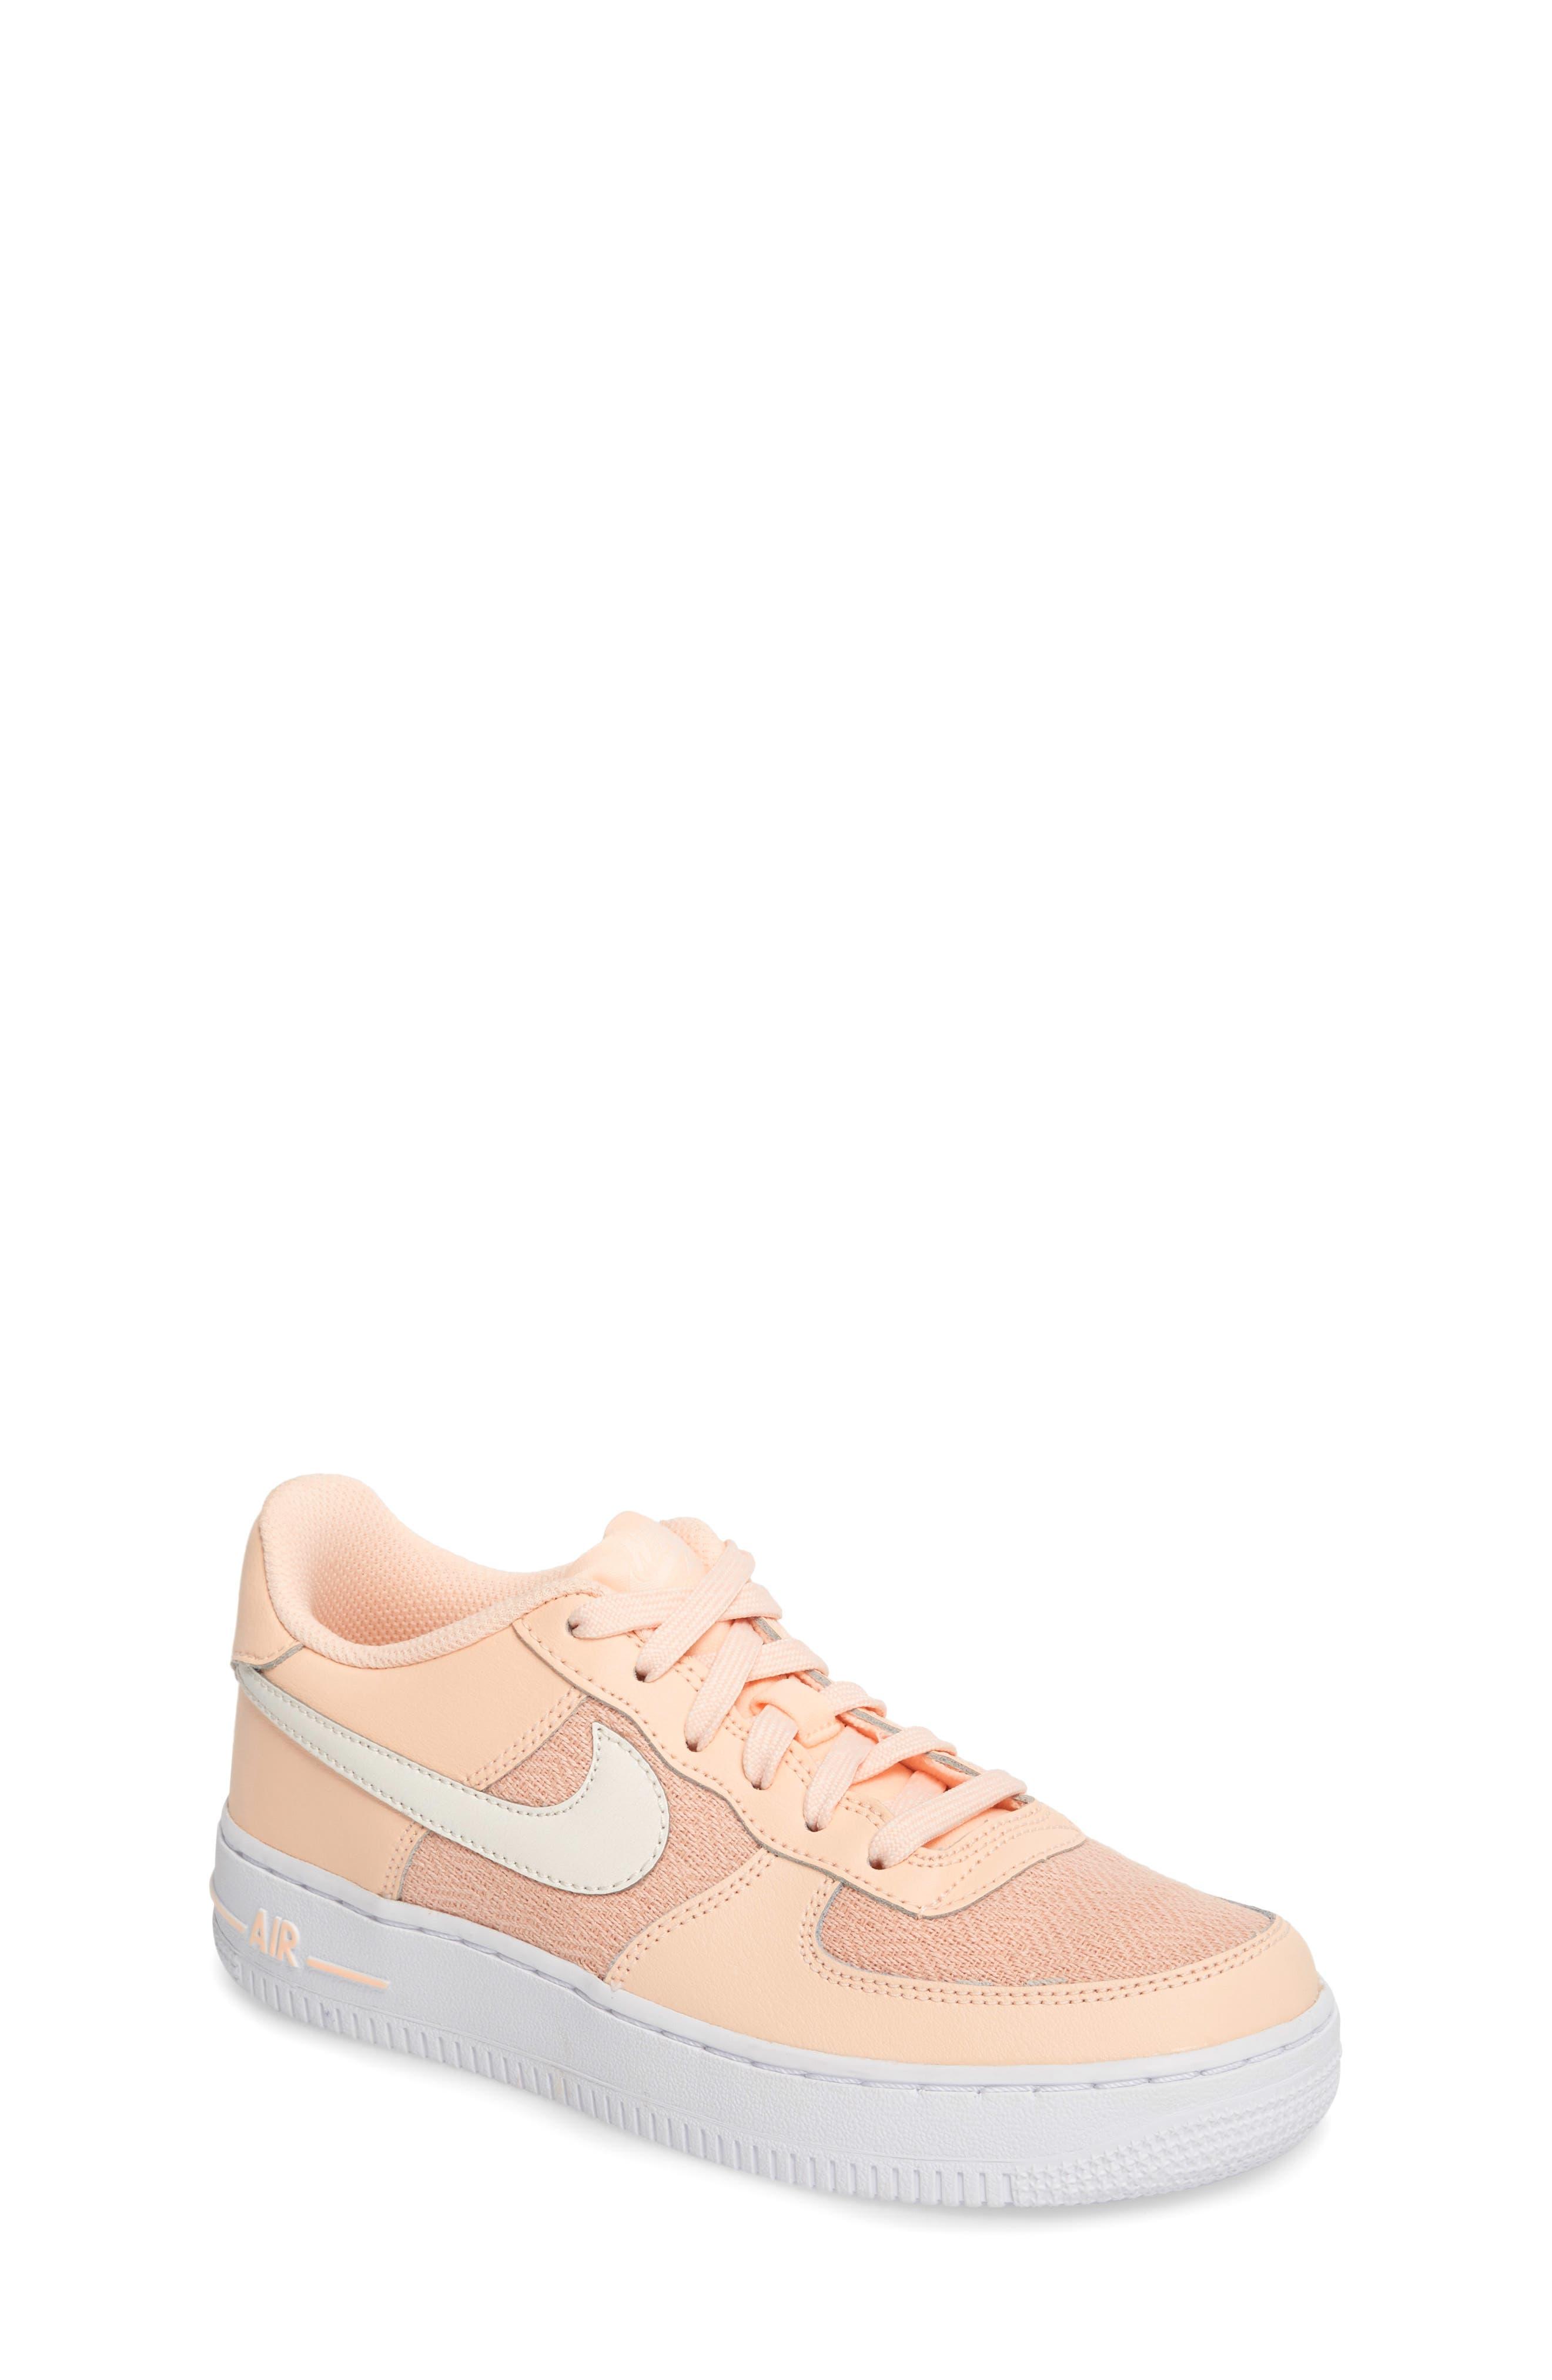 Air Force 1 LV8 Sneaker,                             Main thumbnail 3, color,